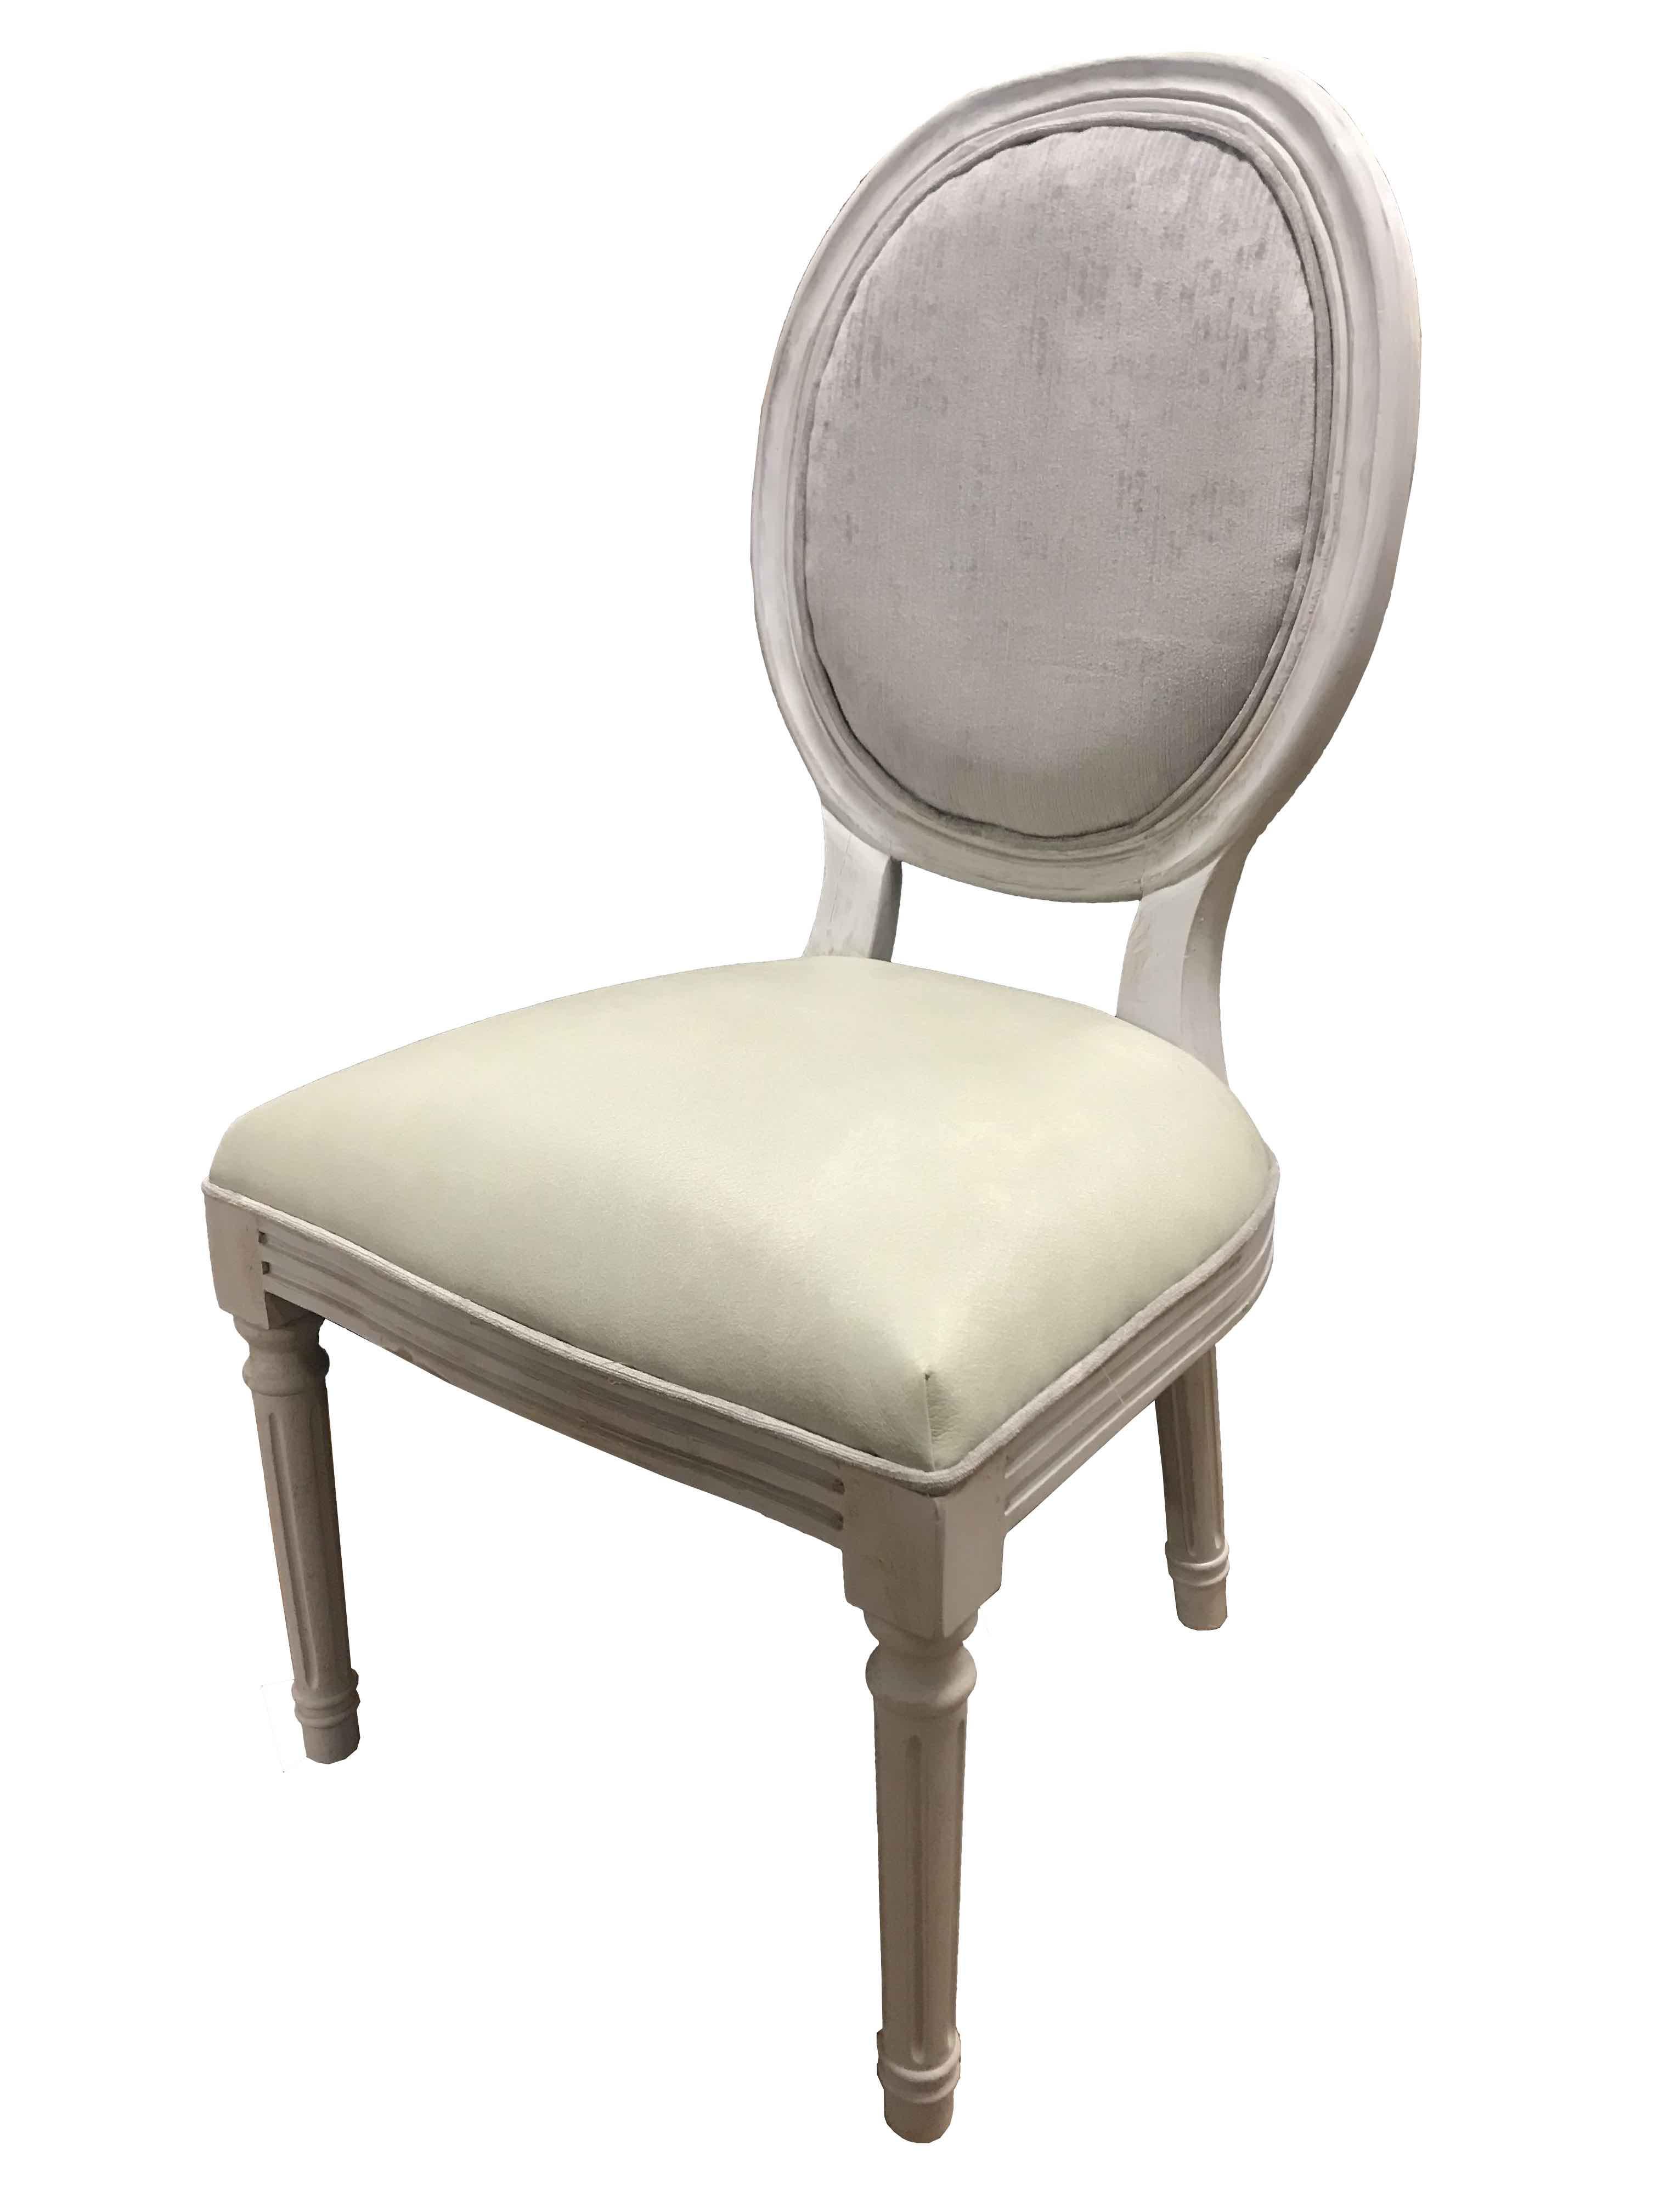 Rustic Medallion White Wash Chair